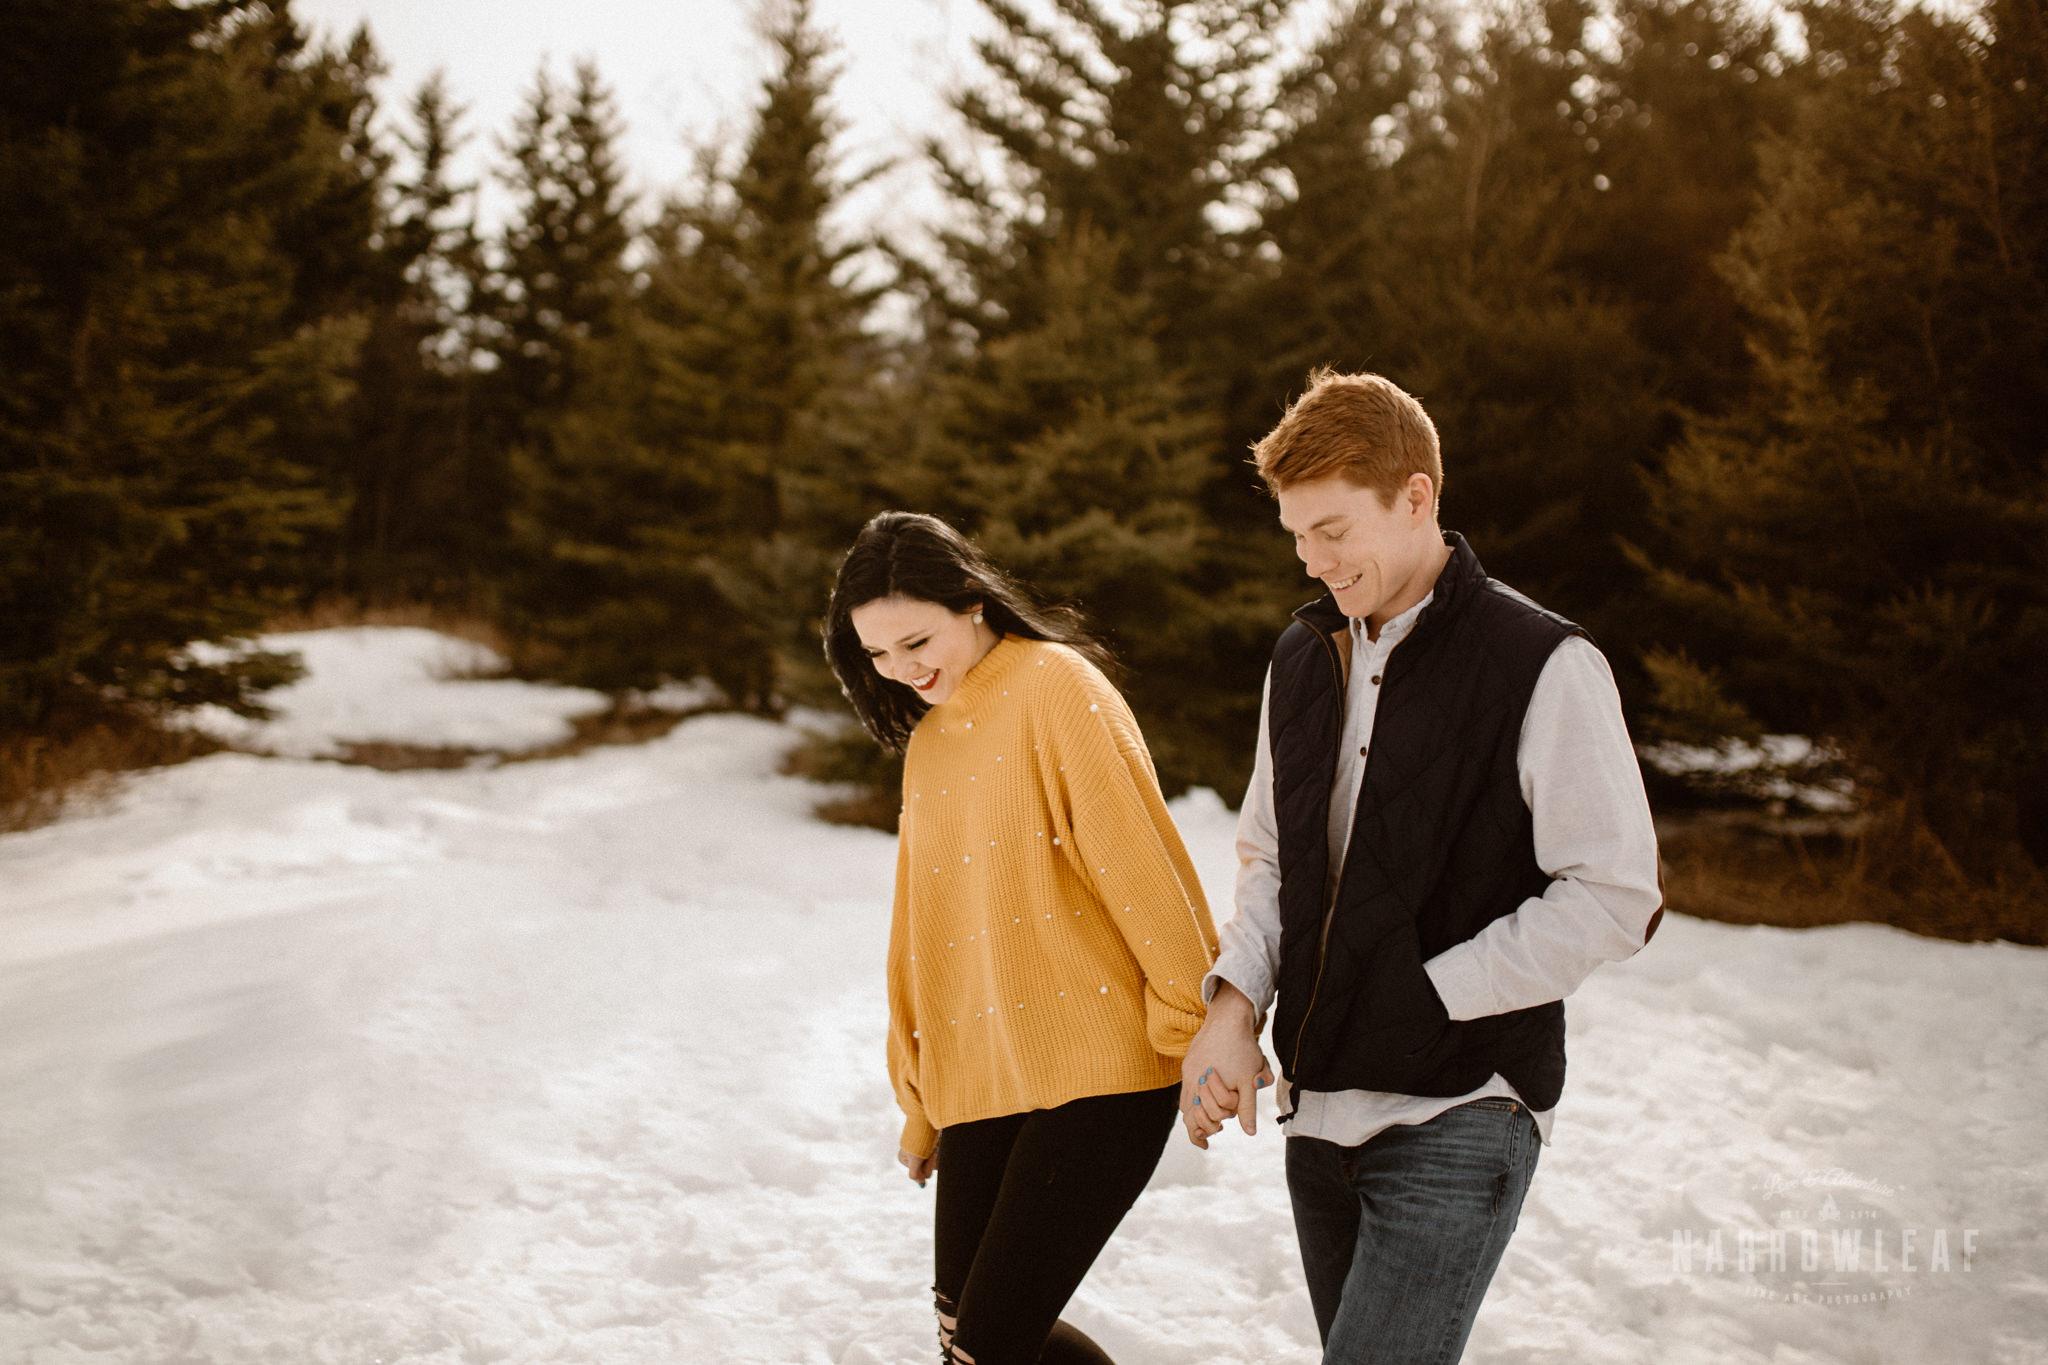 minnesota-winter-engagement-photos-Narrowleaf_Love_and_Adventure_Photography-9533.jpg